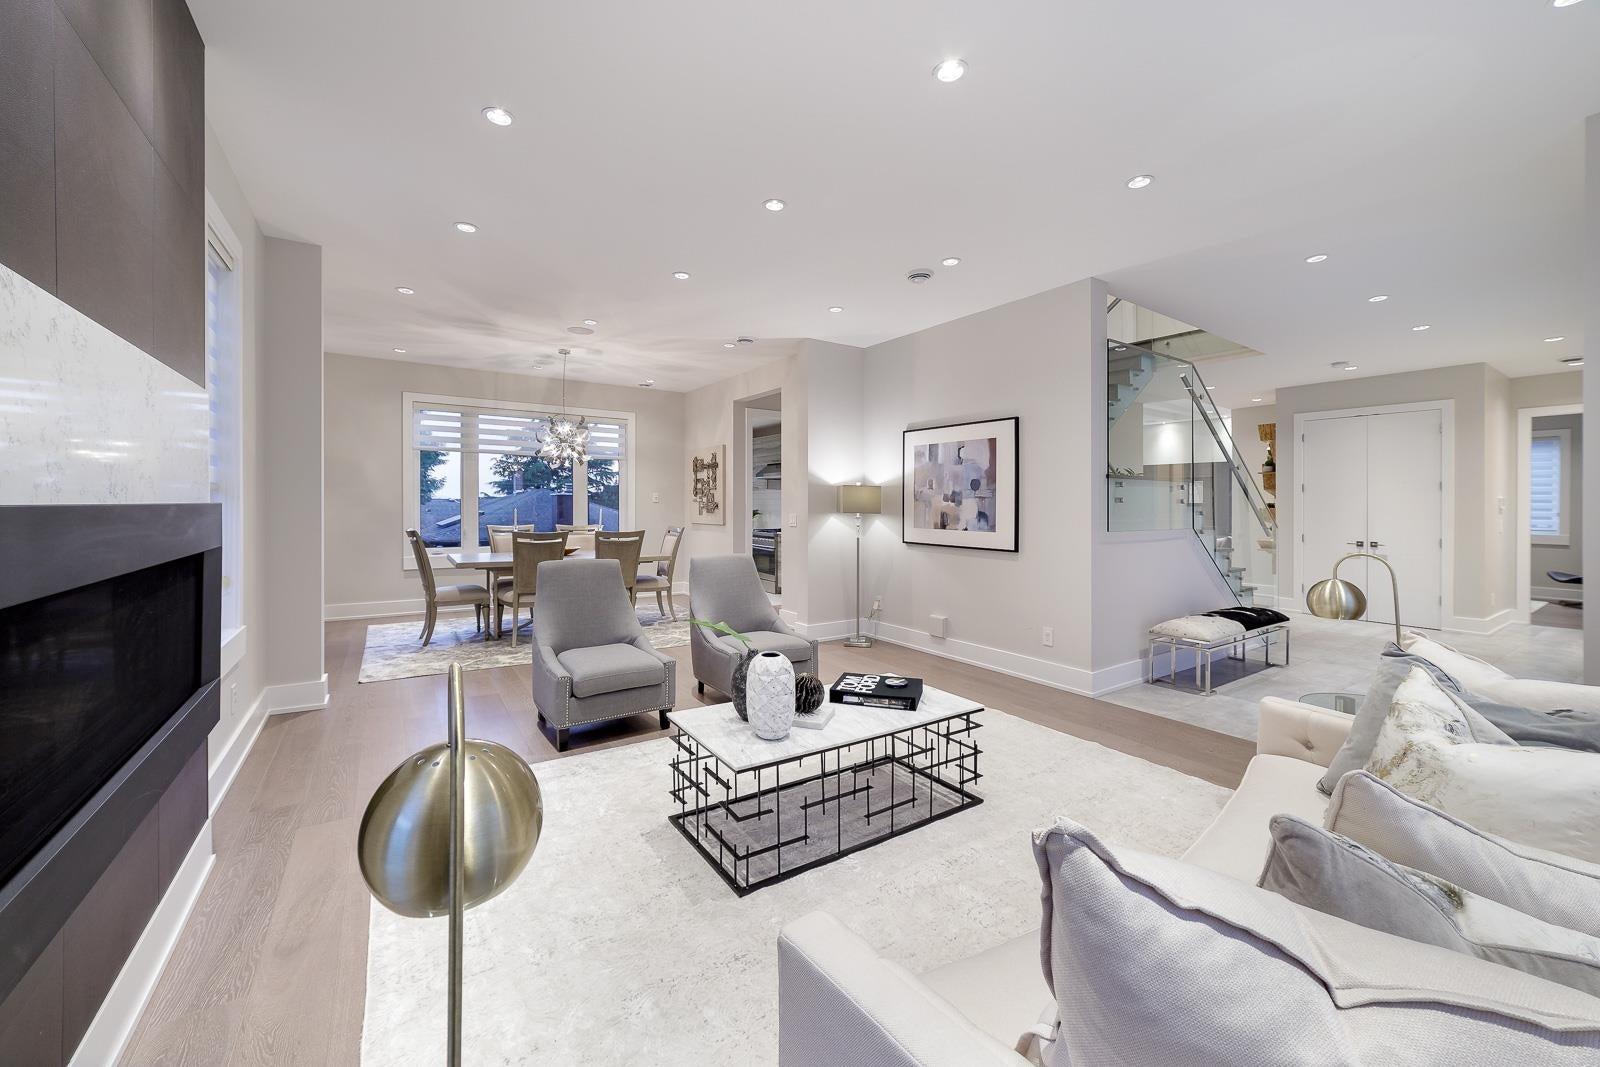 517 GRANADA CRESCENT - Upper Delbrook House/Single Family for sale, 8 Bedrooms (R2615057) - #4